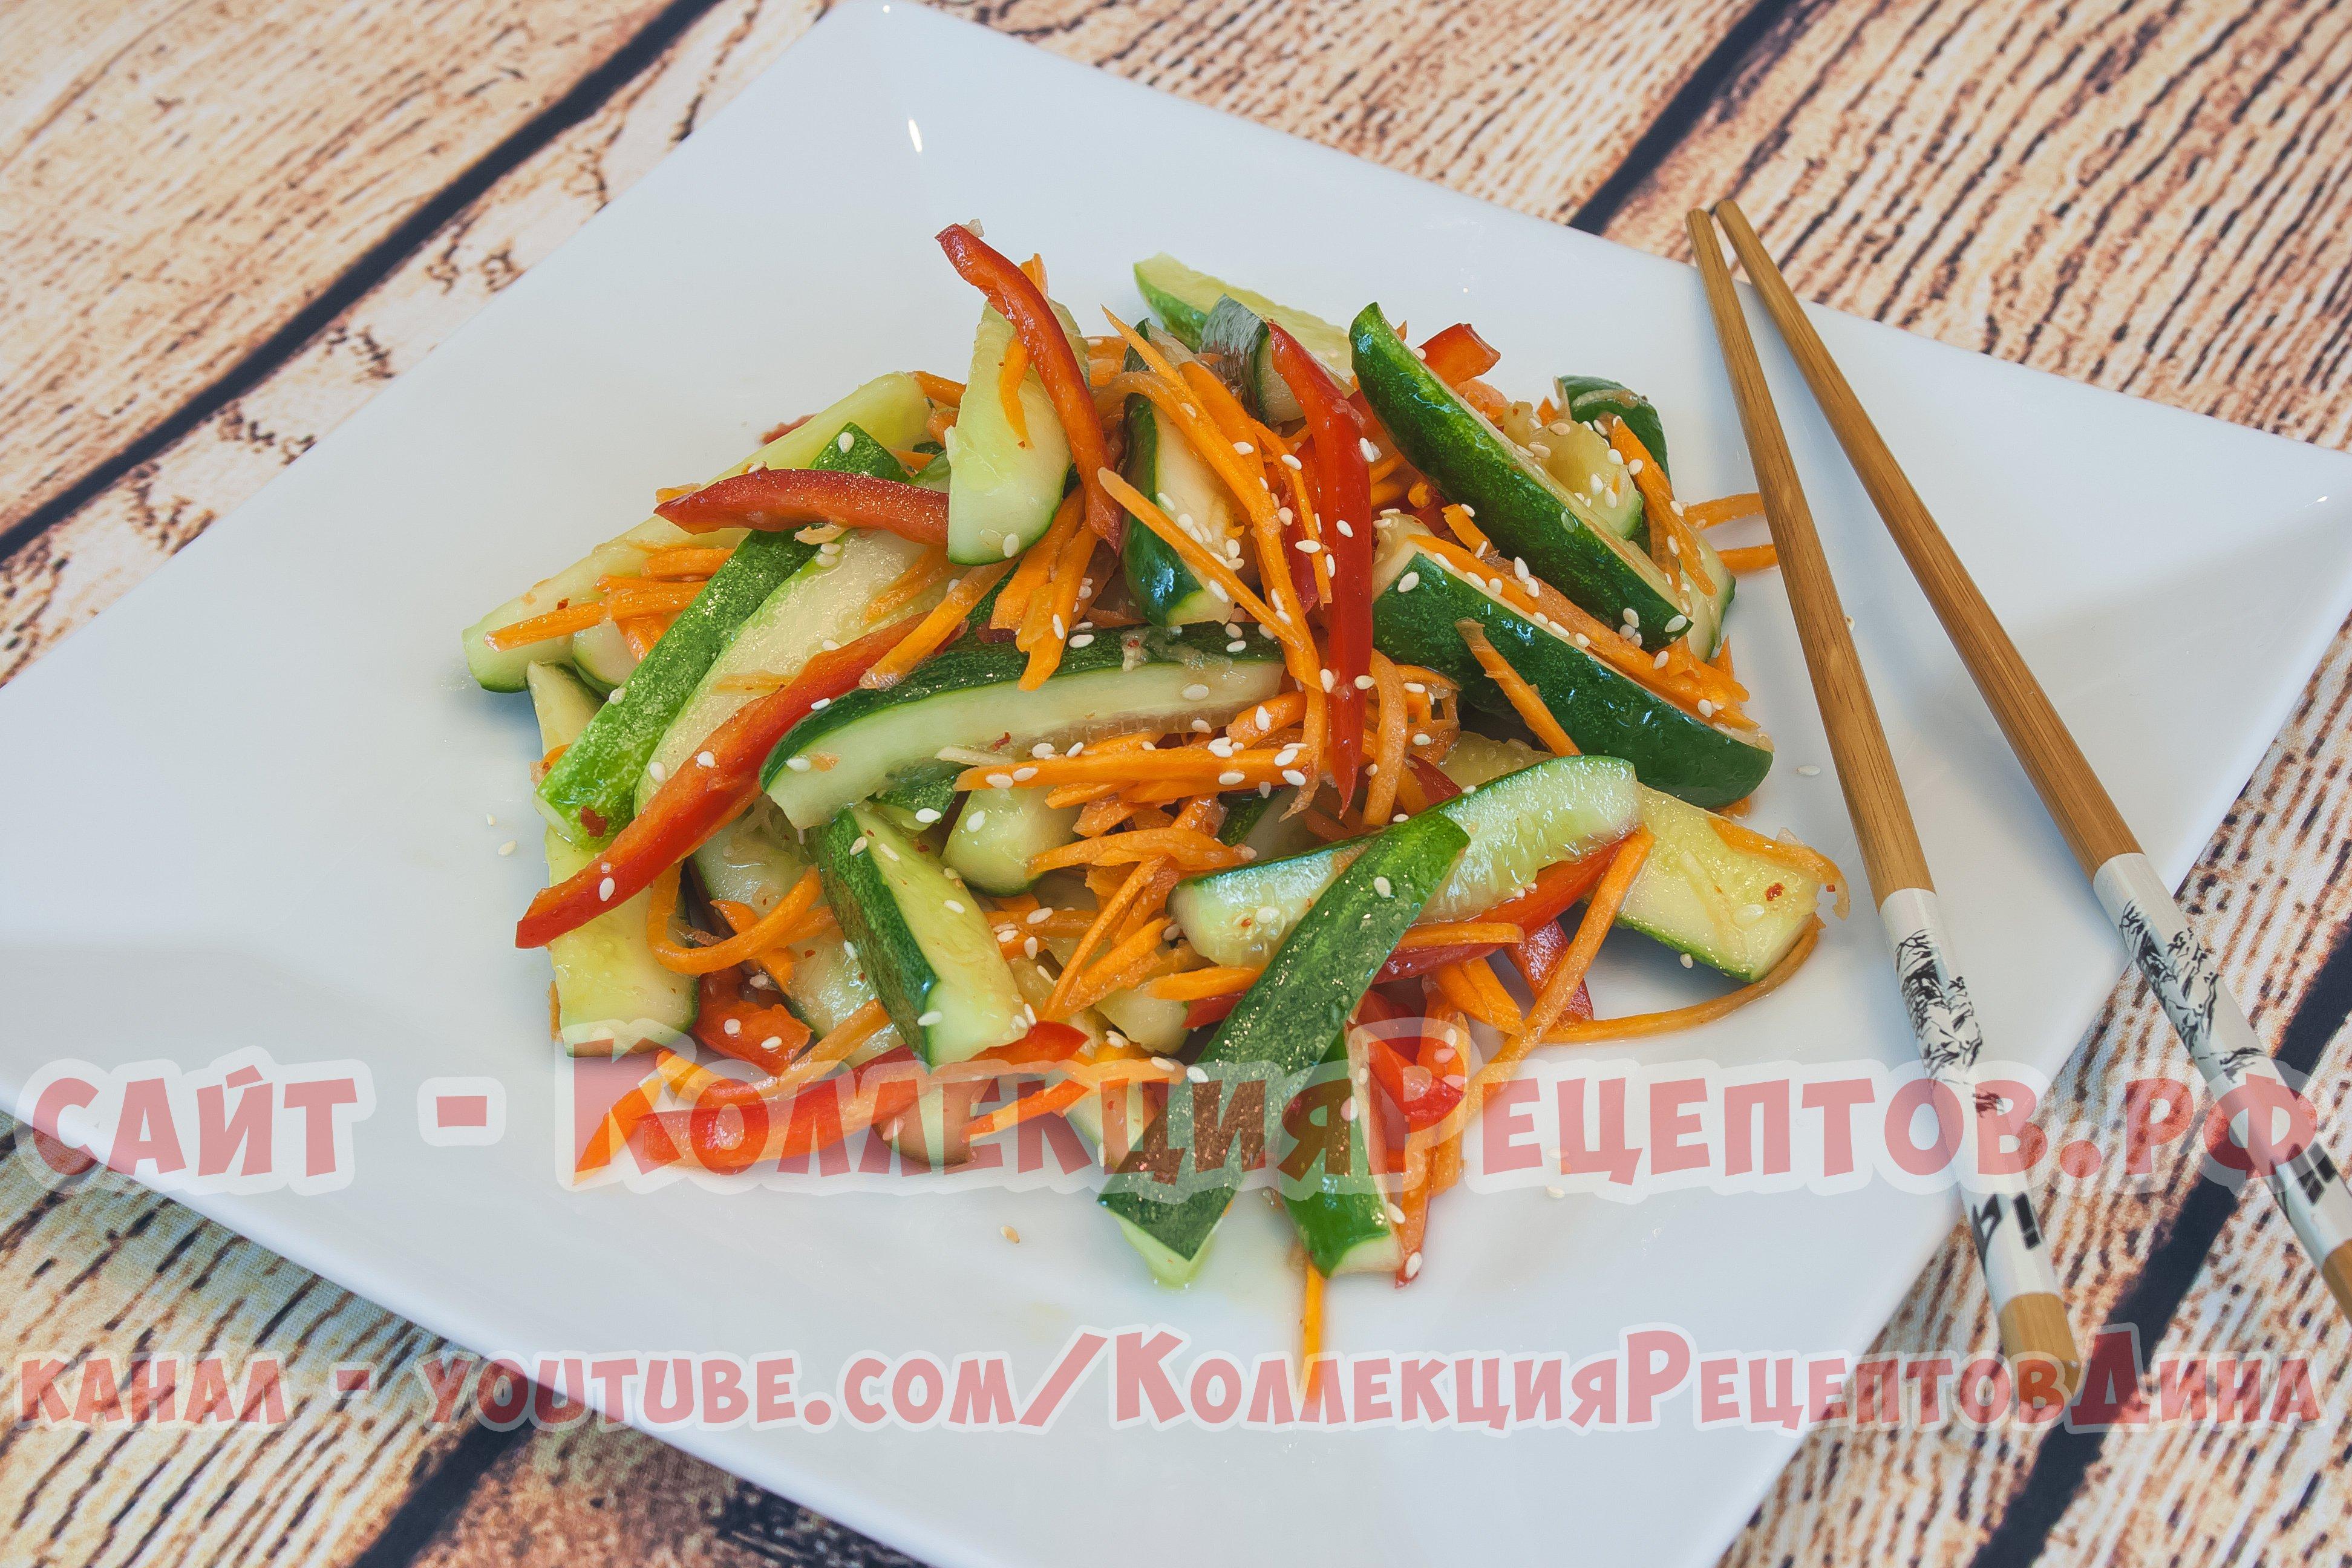 Морковь по-корейски в домашних условиях рецепт с огурцами